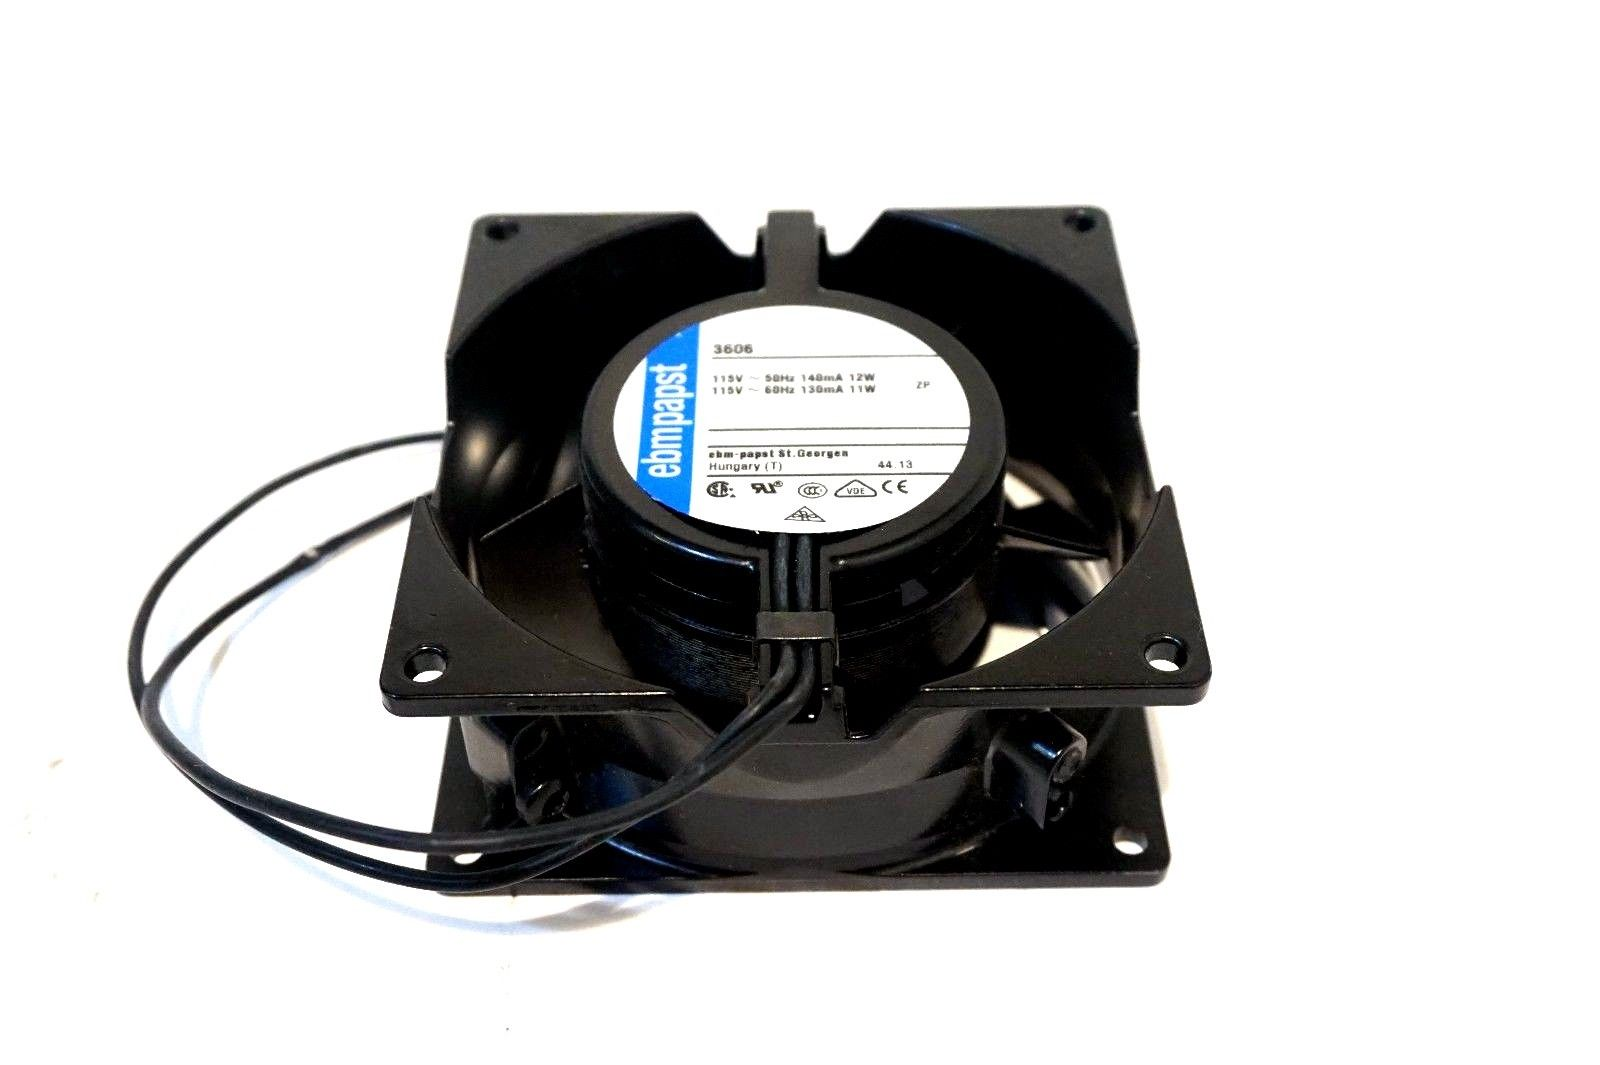 Sb industrial supply mro plc industrial equipment parts for Ebm papst fan motor